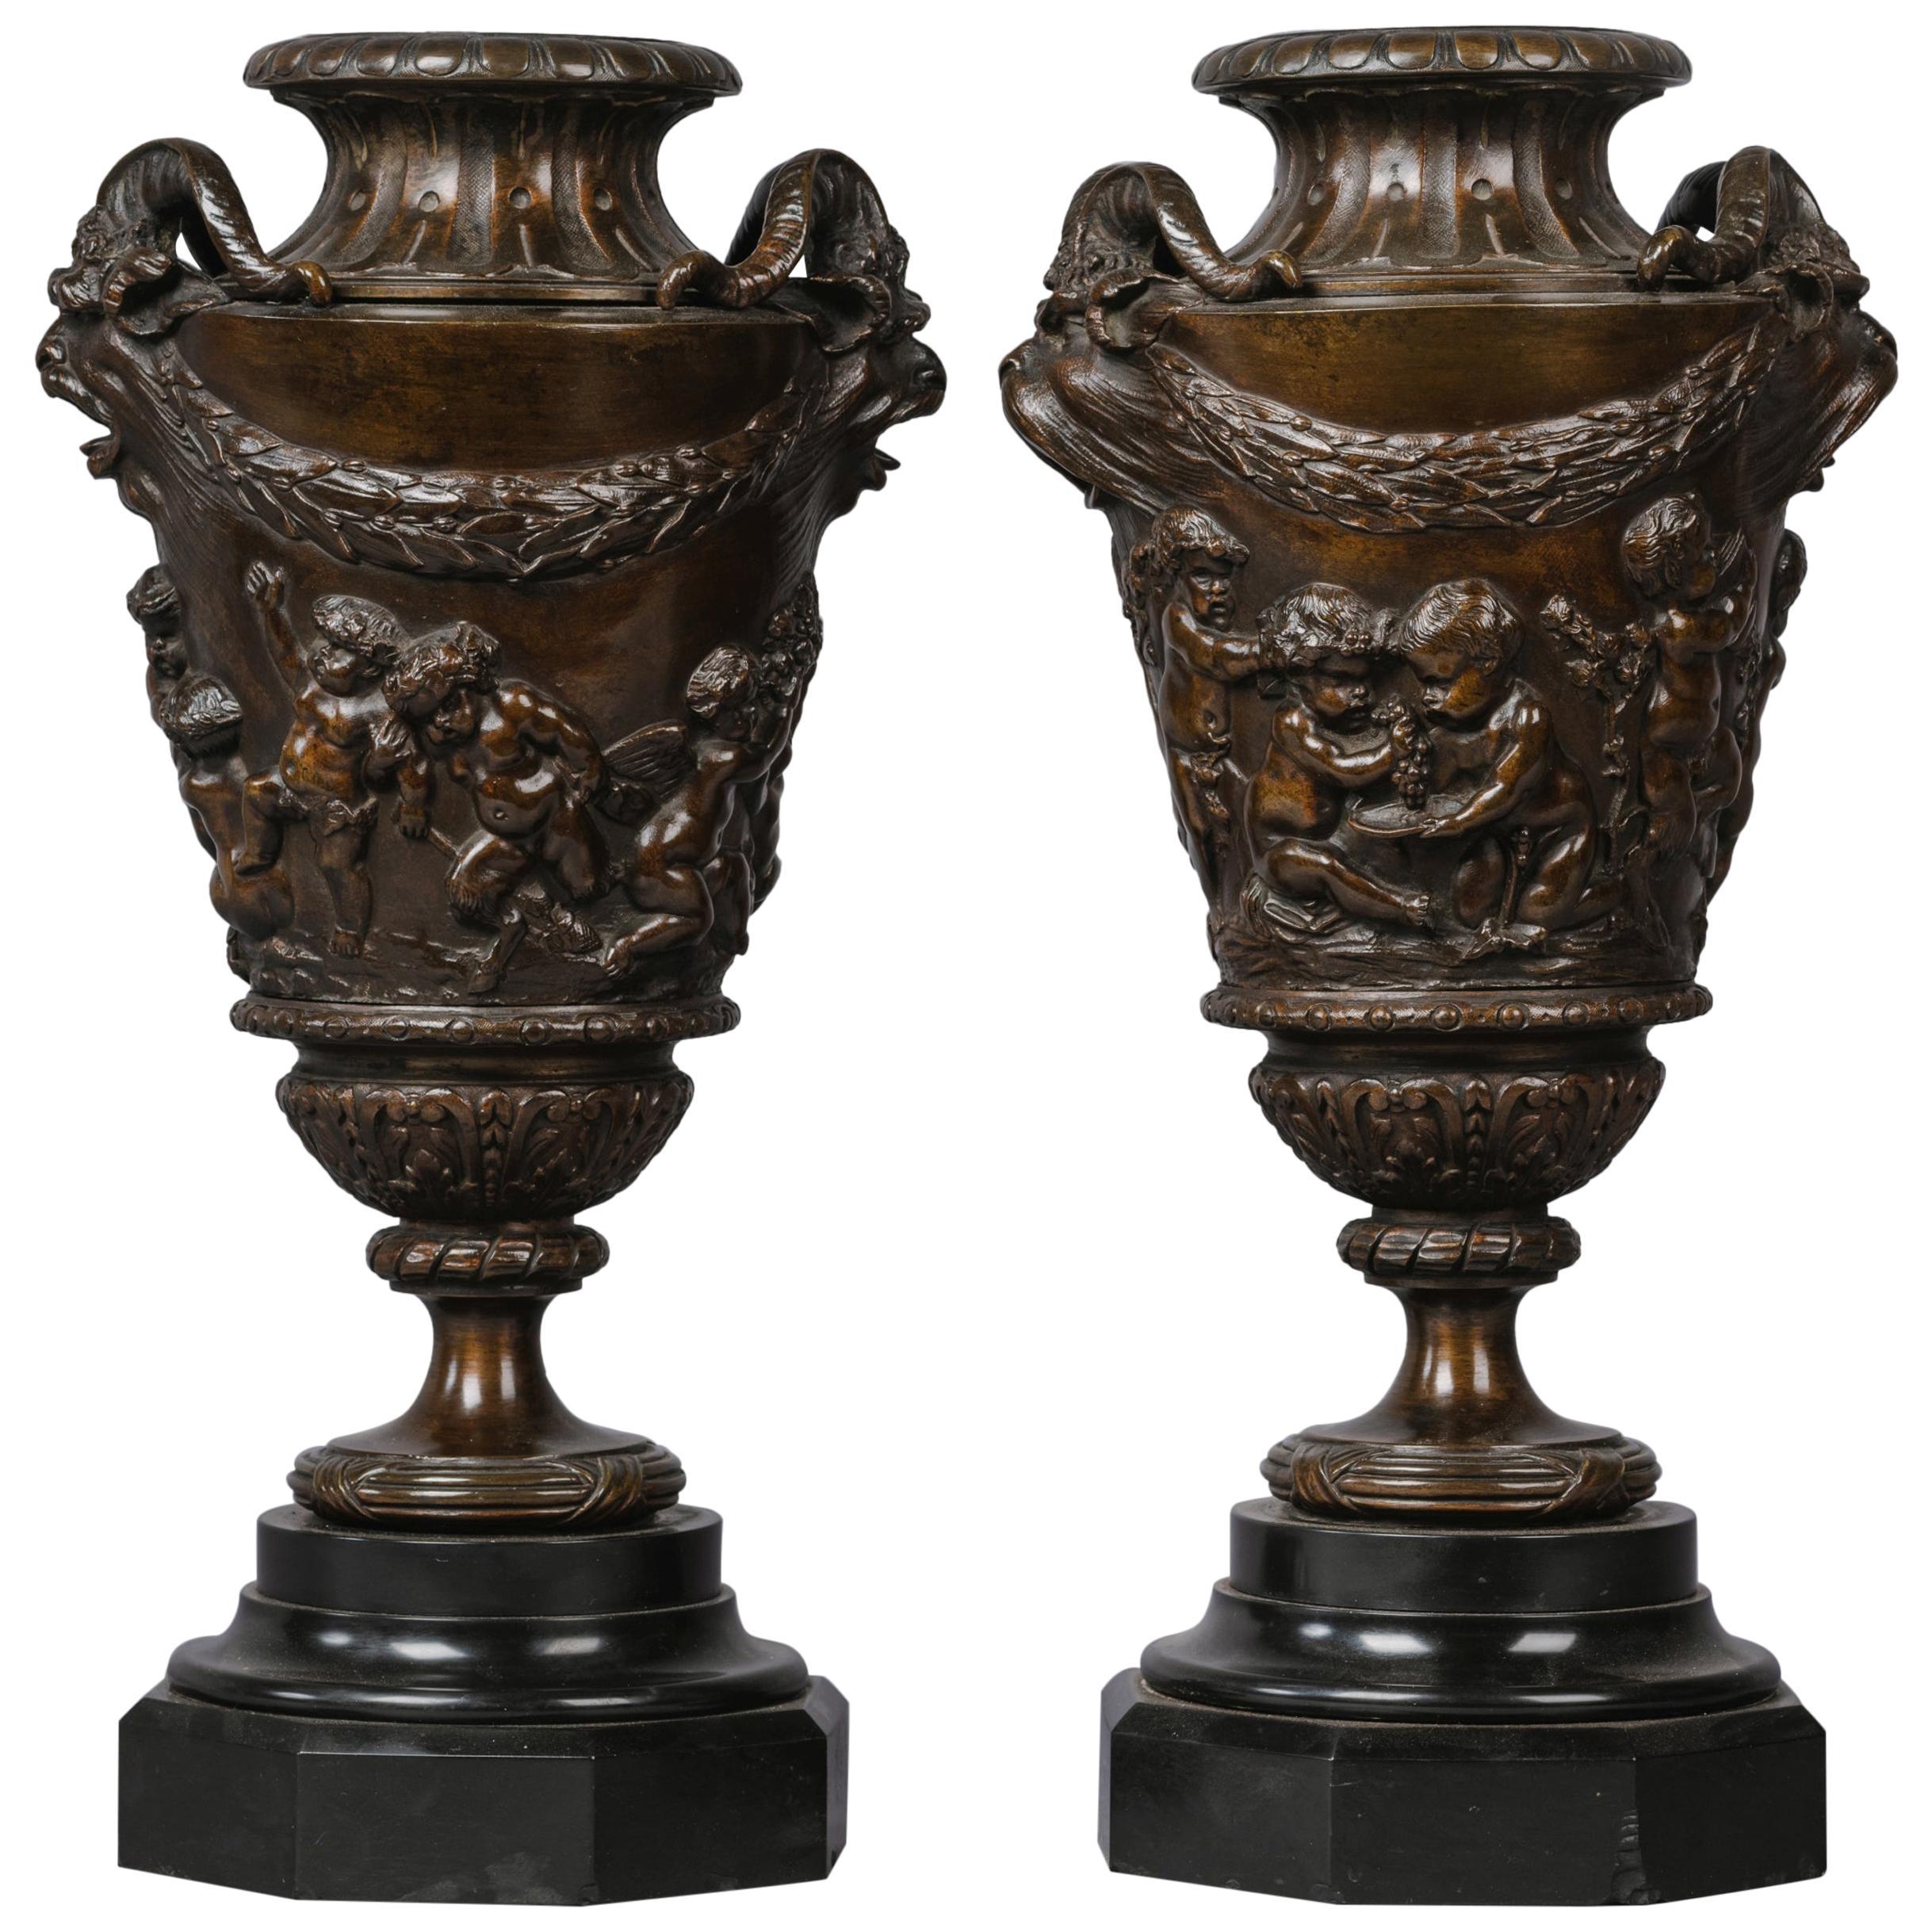 Fine Pair of Patinated Bronze Bacchanalian Vases